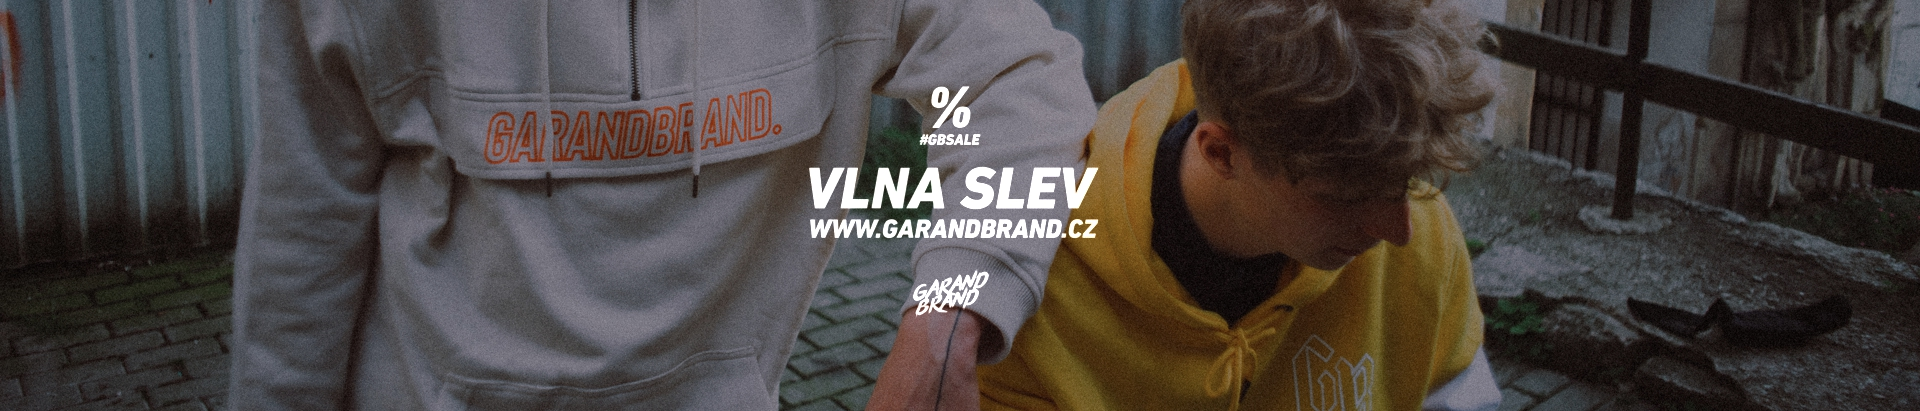 gb sale